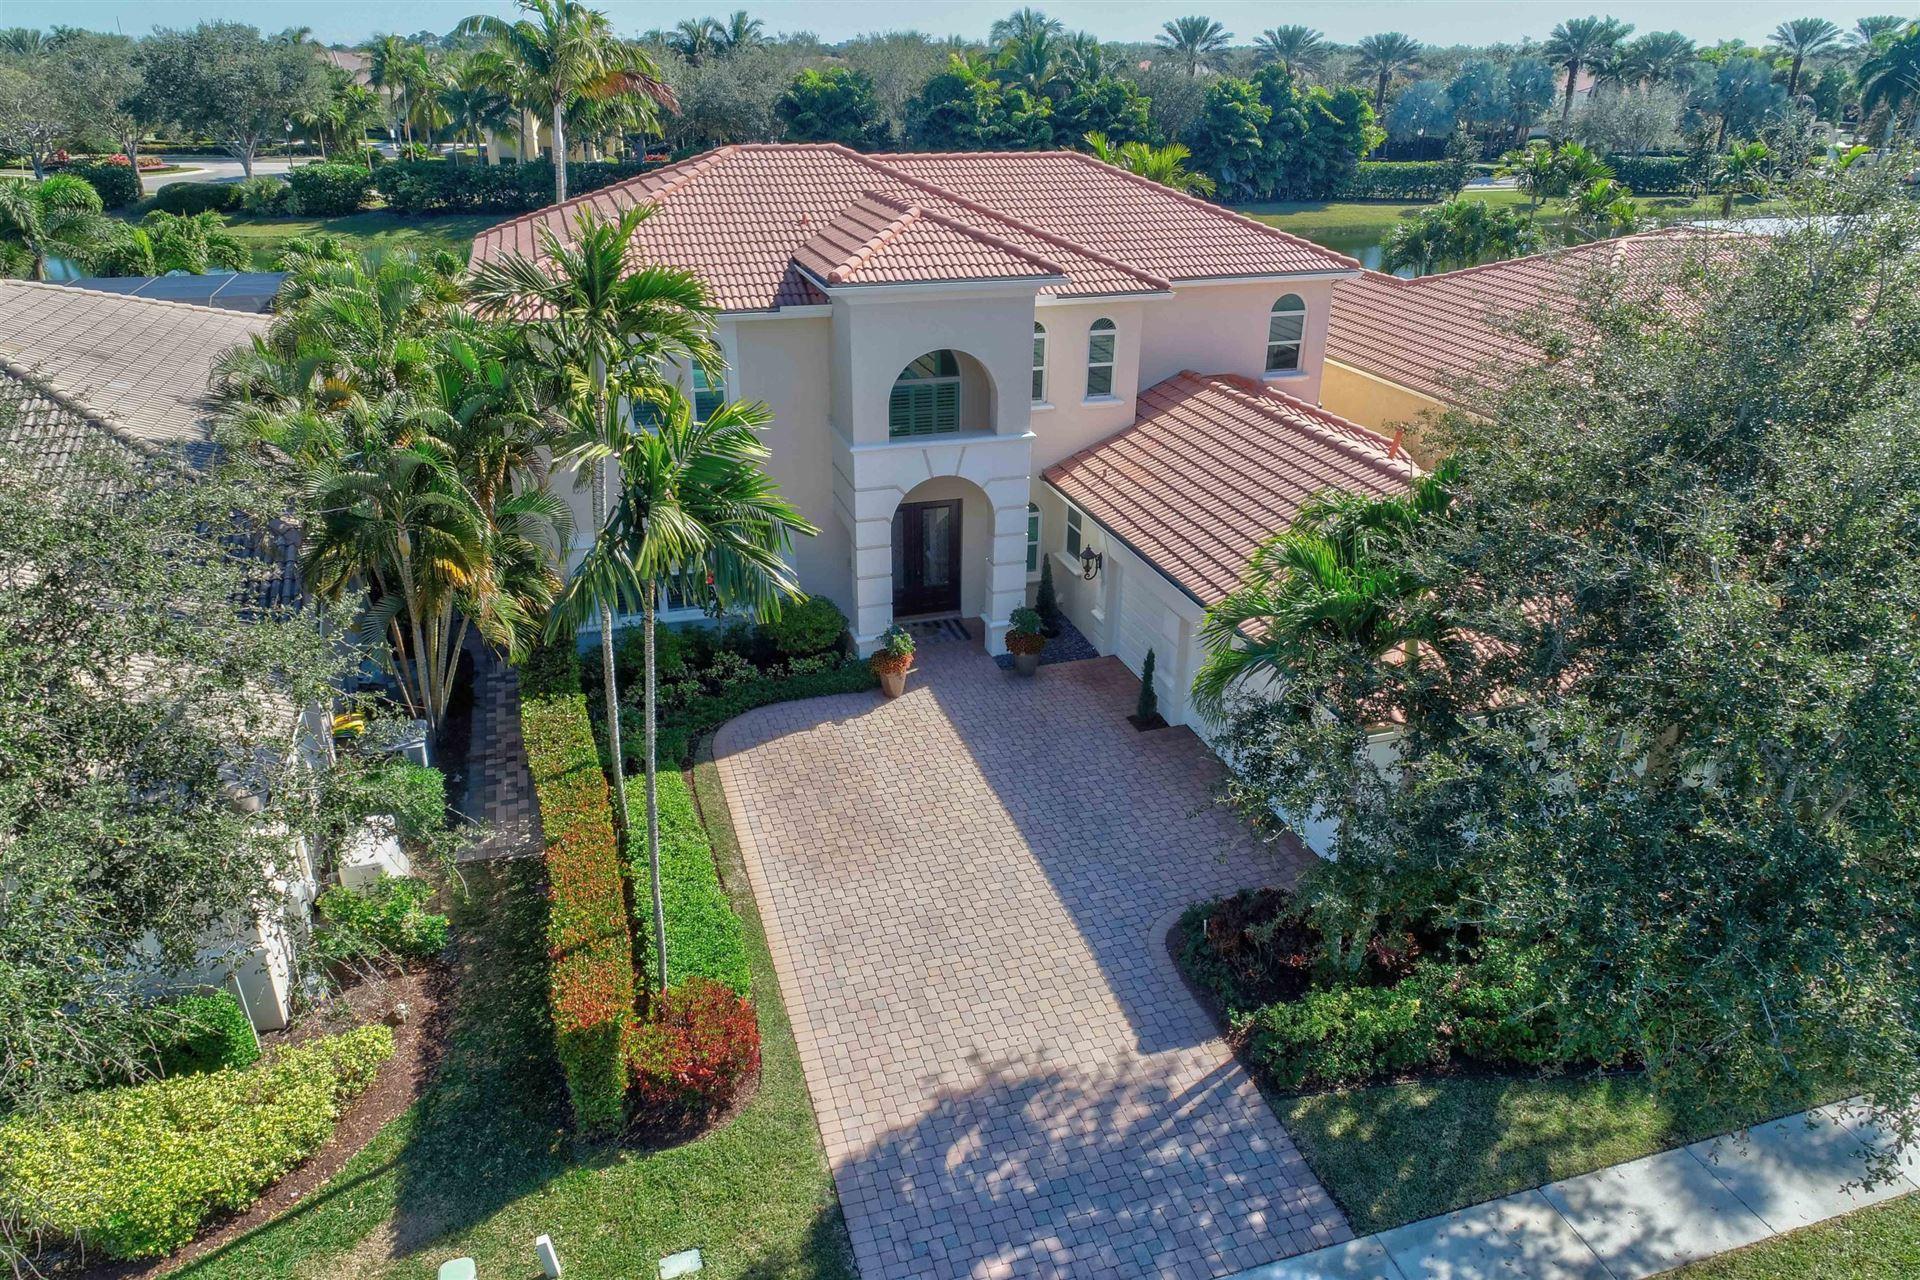 Photo of 267 Sedona Way, Palm Beach Gardens, FL 33418 (MLS # RX-10685560)